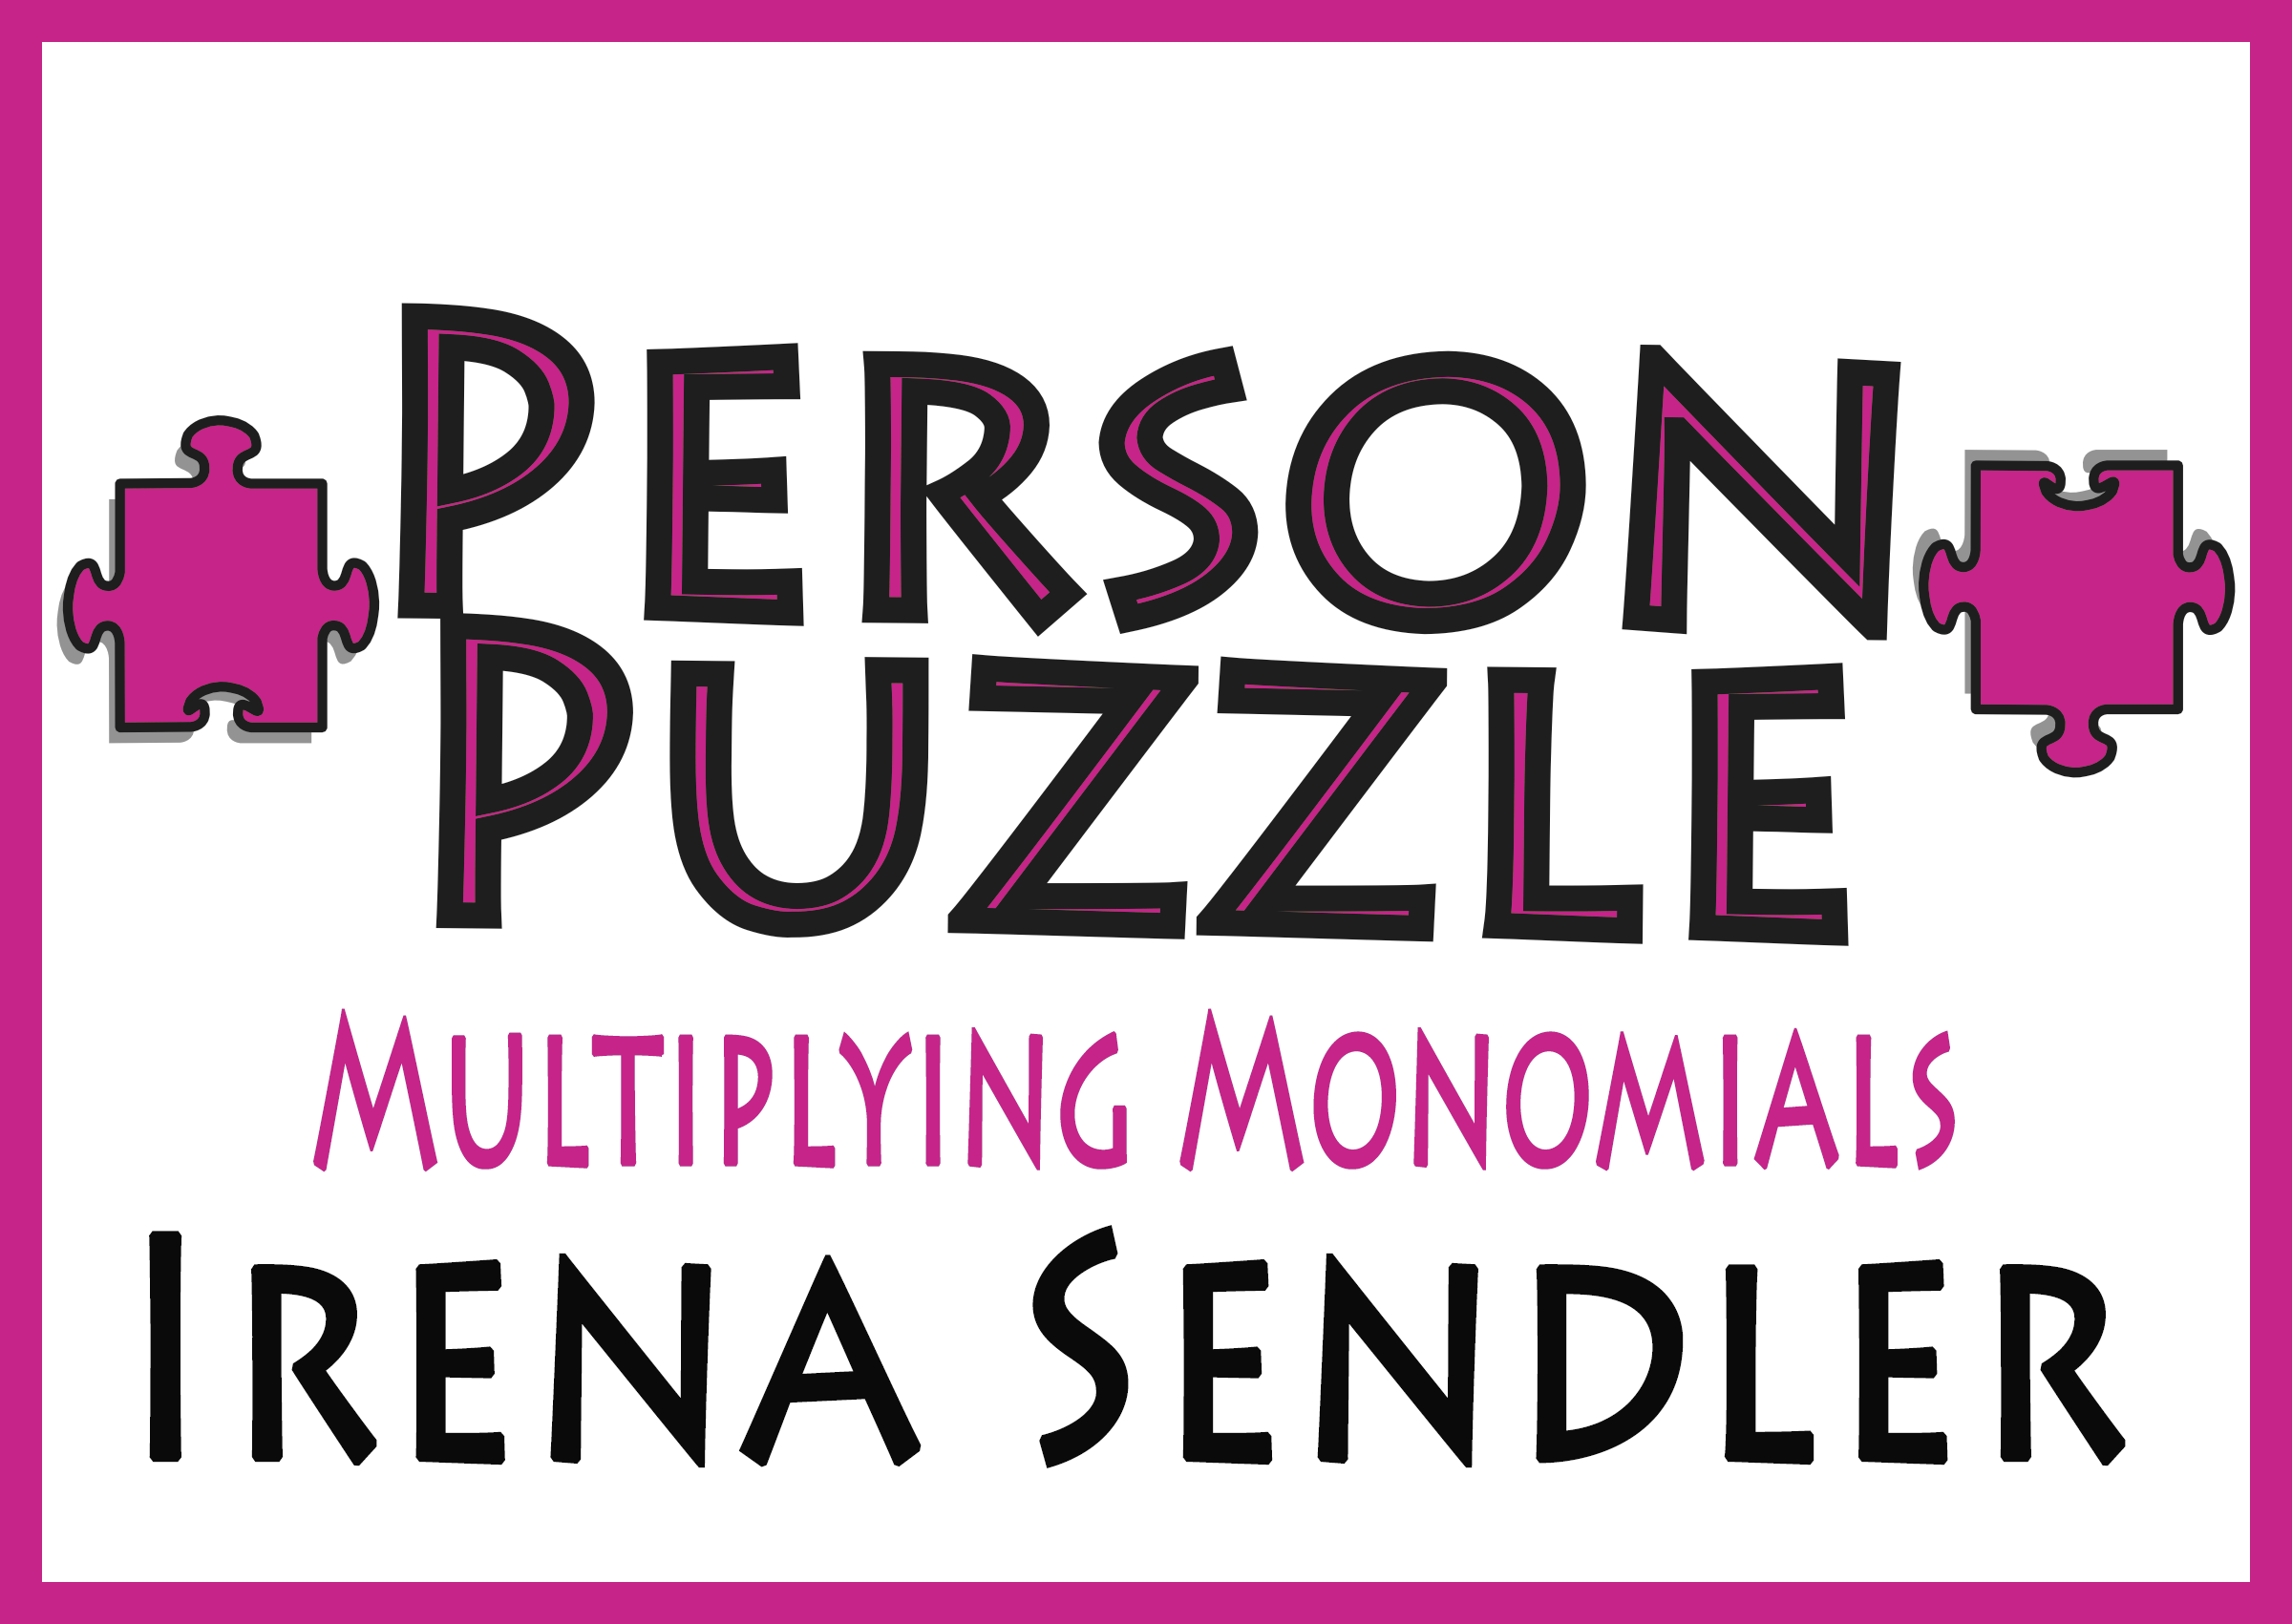 Person Puzzle Multiplying Monomials